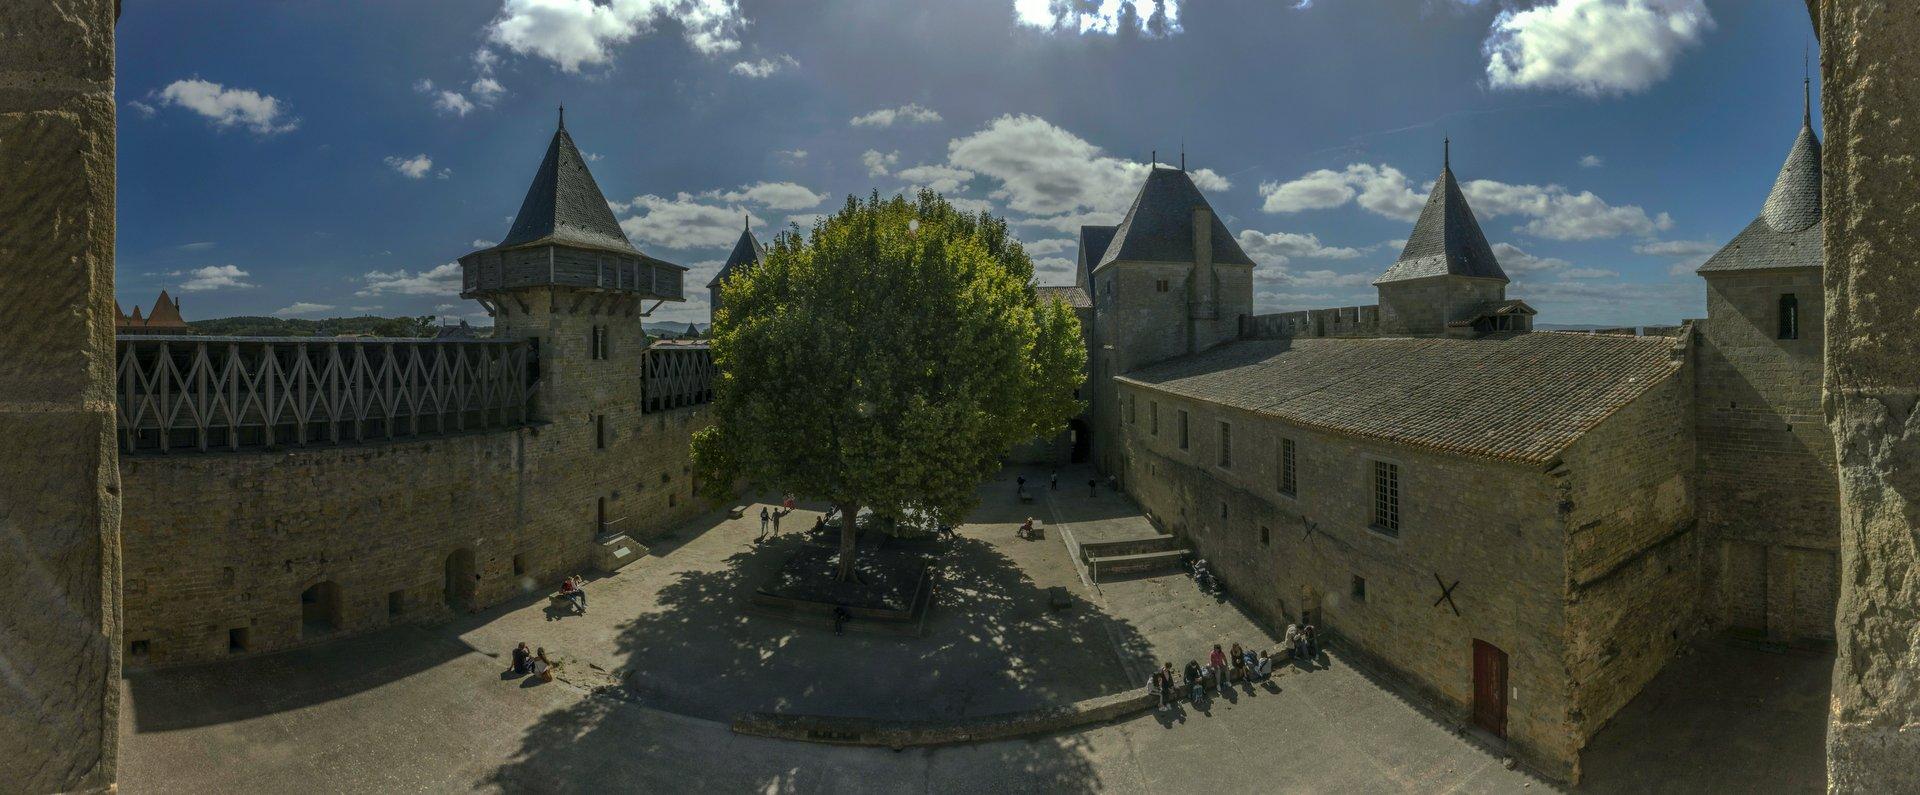 Größerer Innenhof des Château Comtal in der Cité Carcassonne